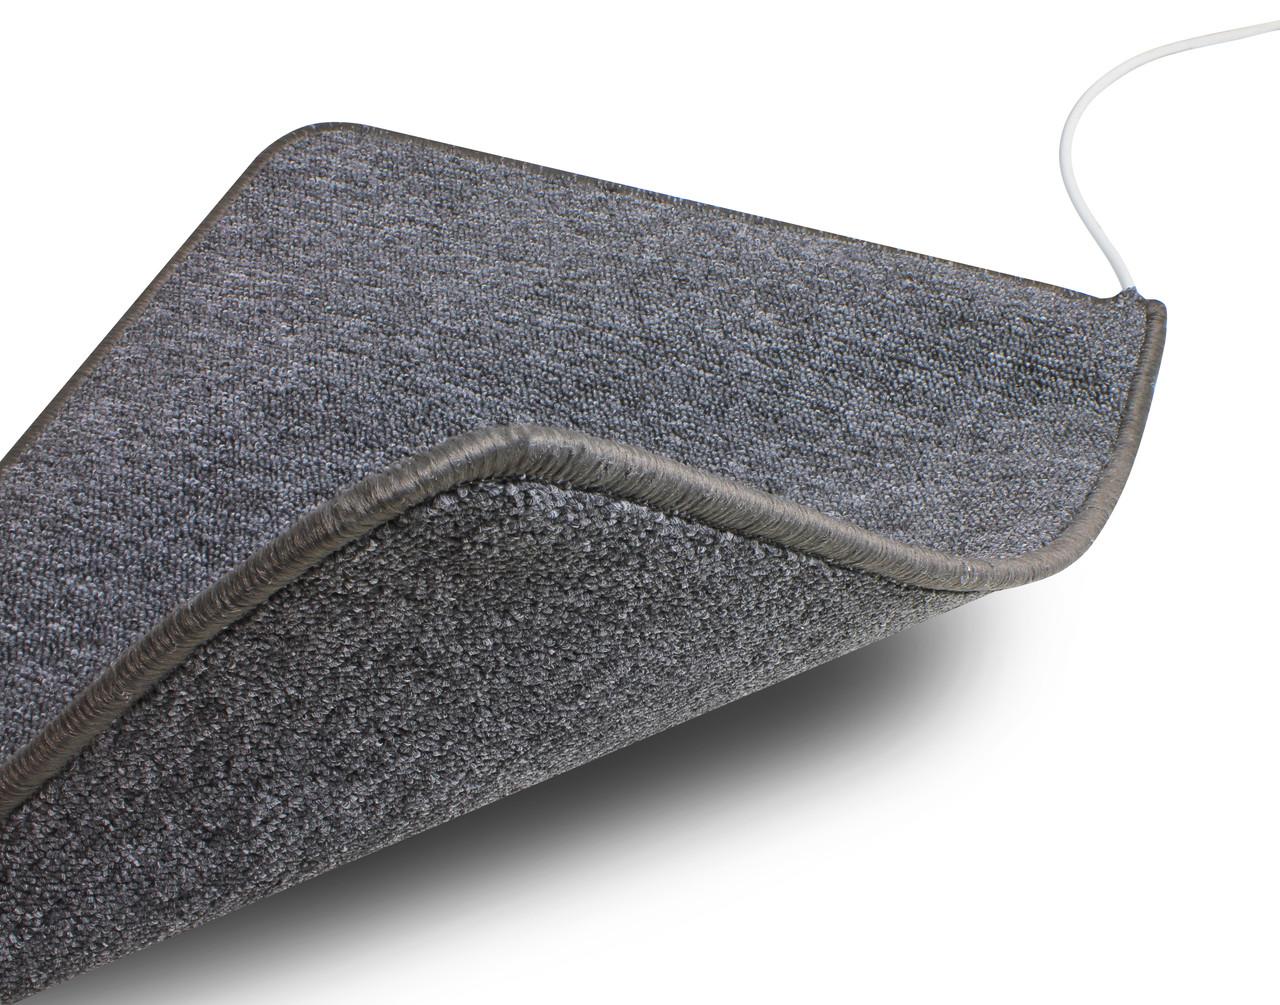 Теплий килимок Solray 530*1830 мм Сірий